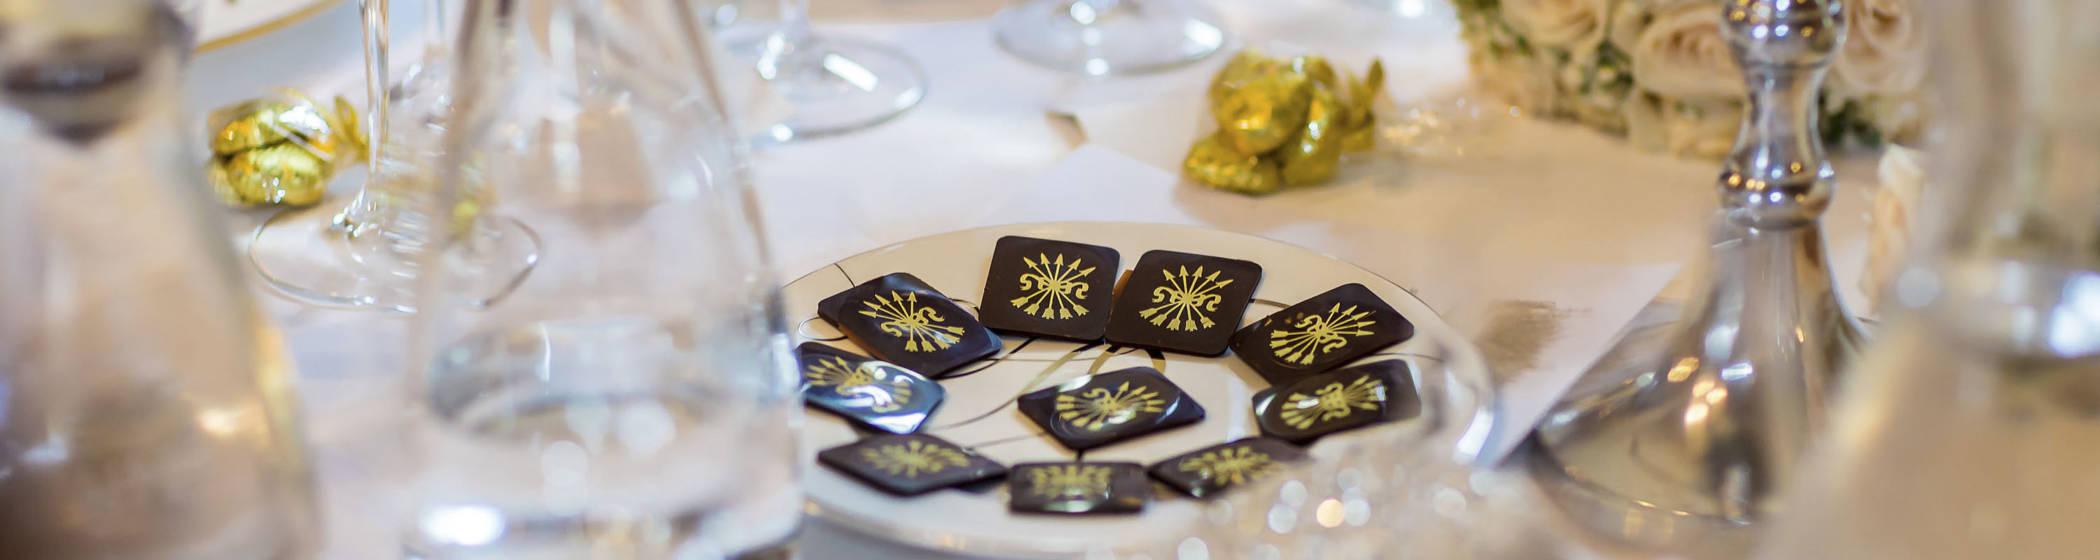 Chocolates on a table at a Waddesdon Manor wedding